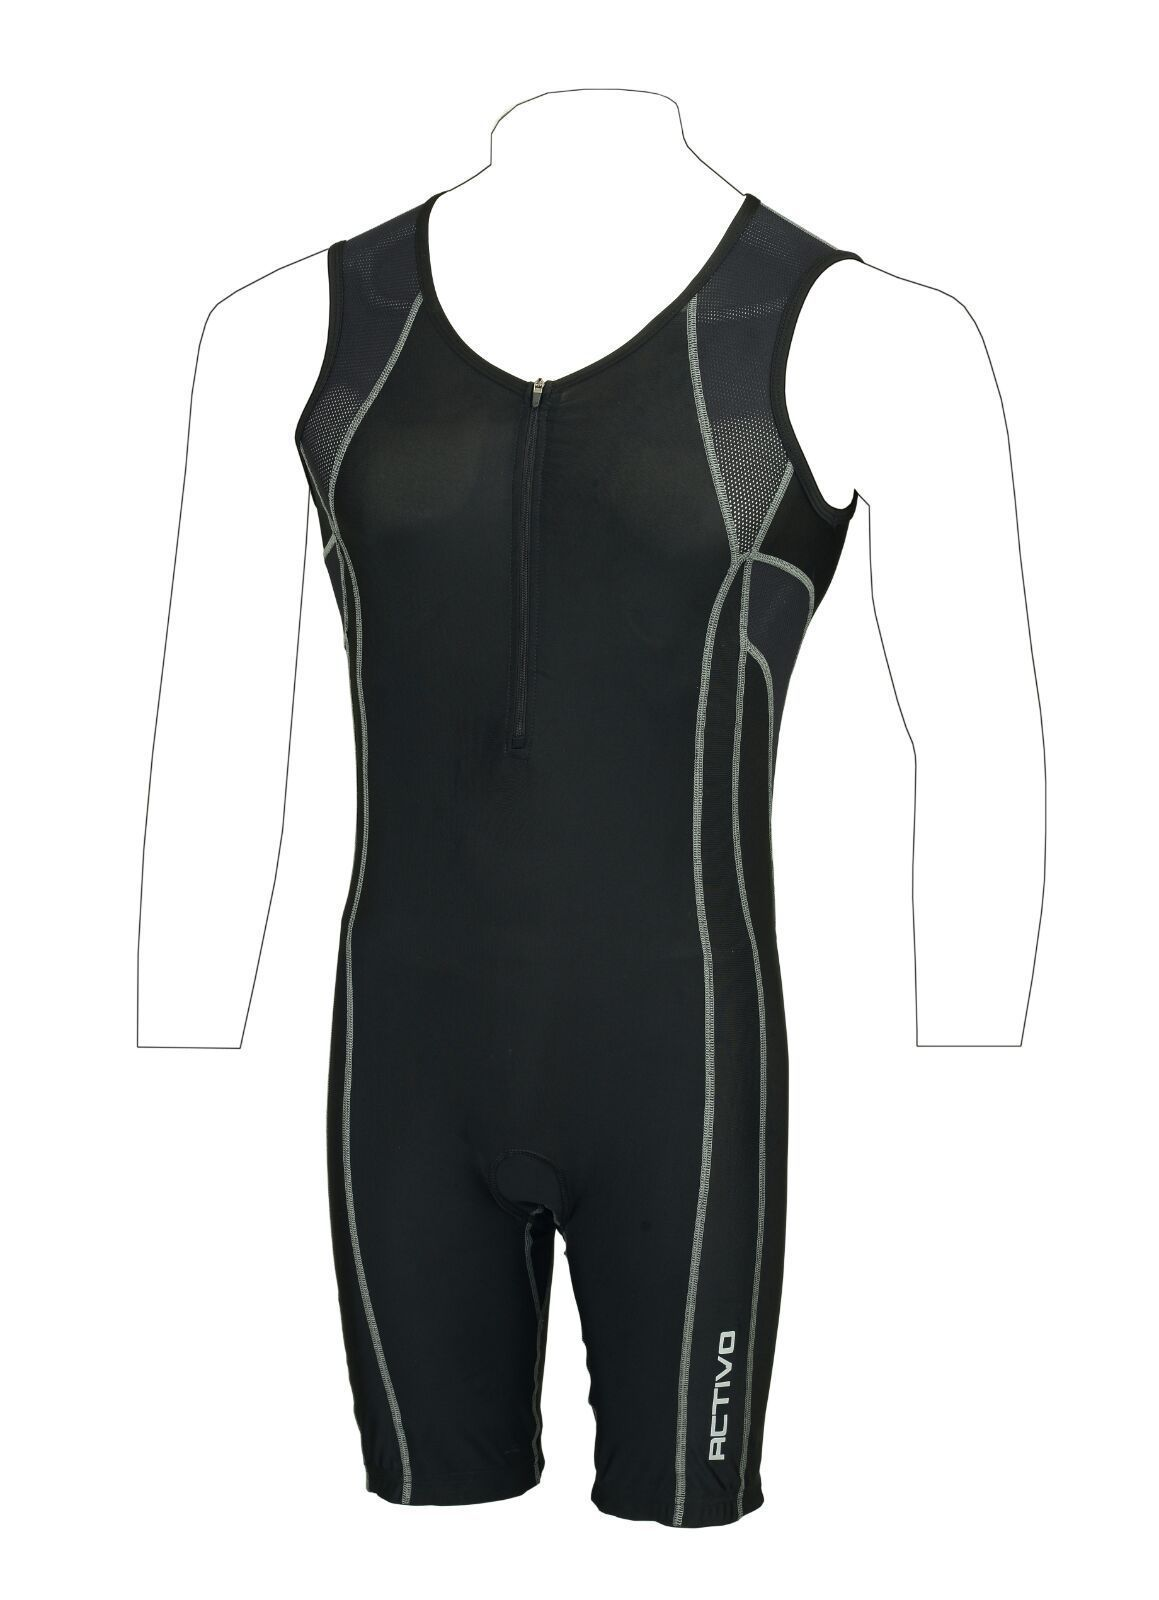 515f077b8fb  Activo mens padded  triathlon tri suit duathlon running  cycling swim  tritard